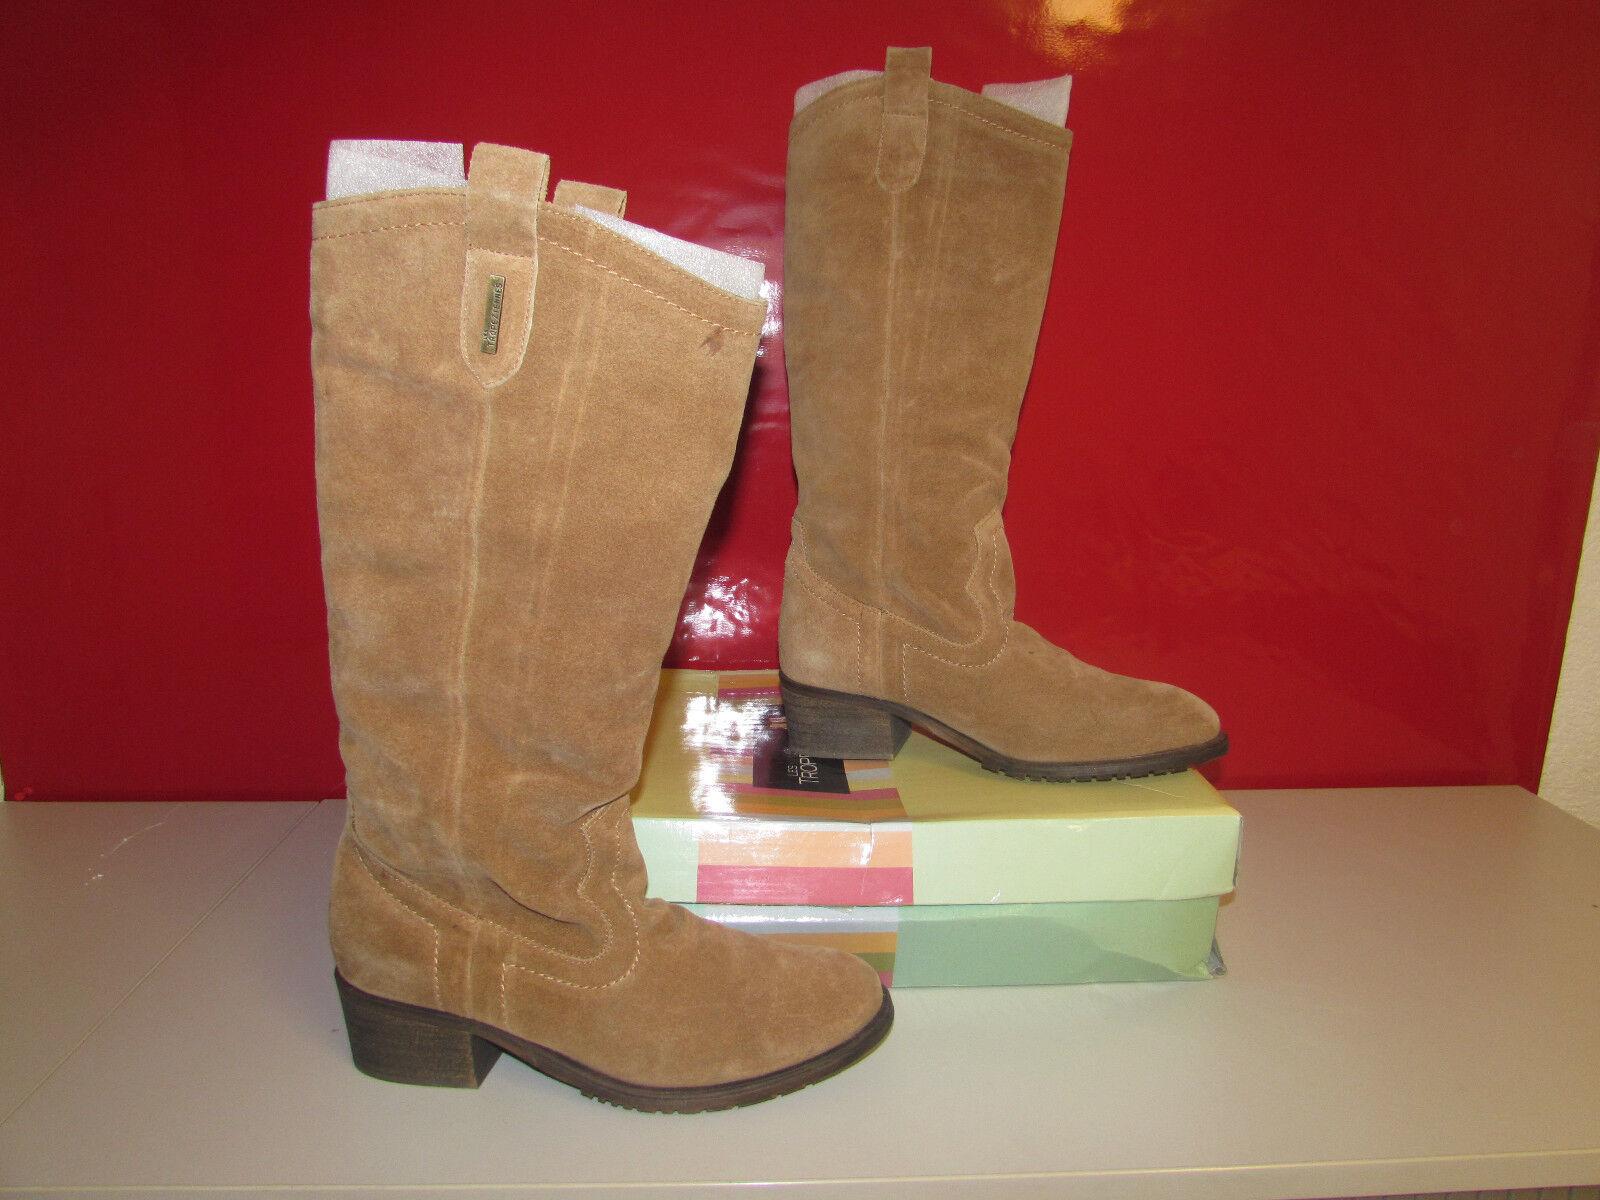 Les Tropziennes  Damen Damen Damen Stiefel EU41 0152d2